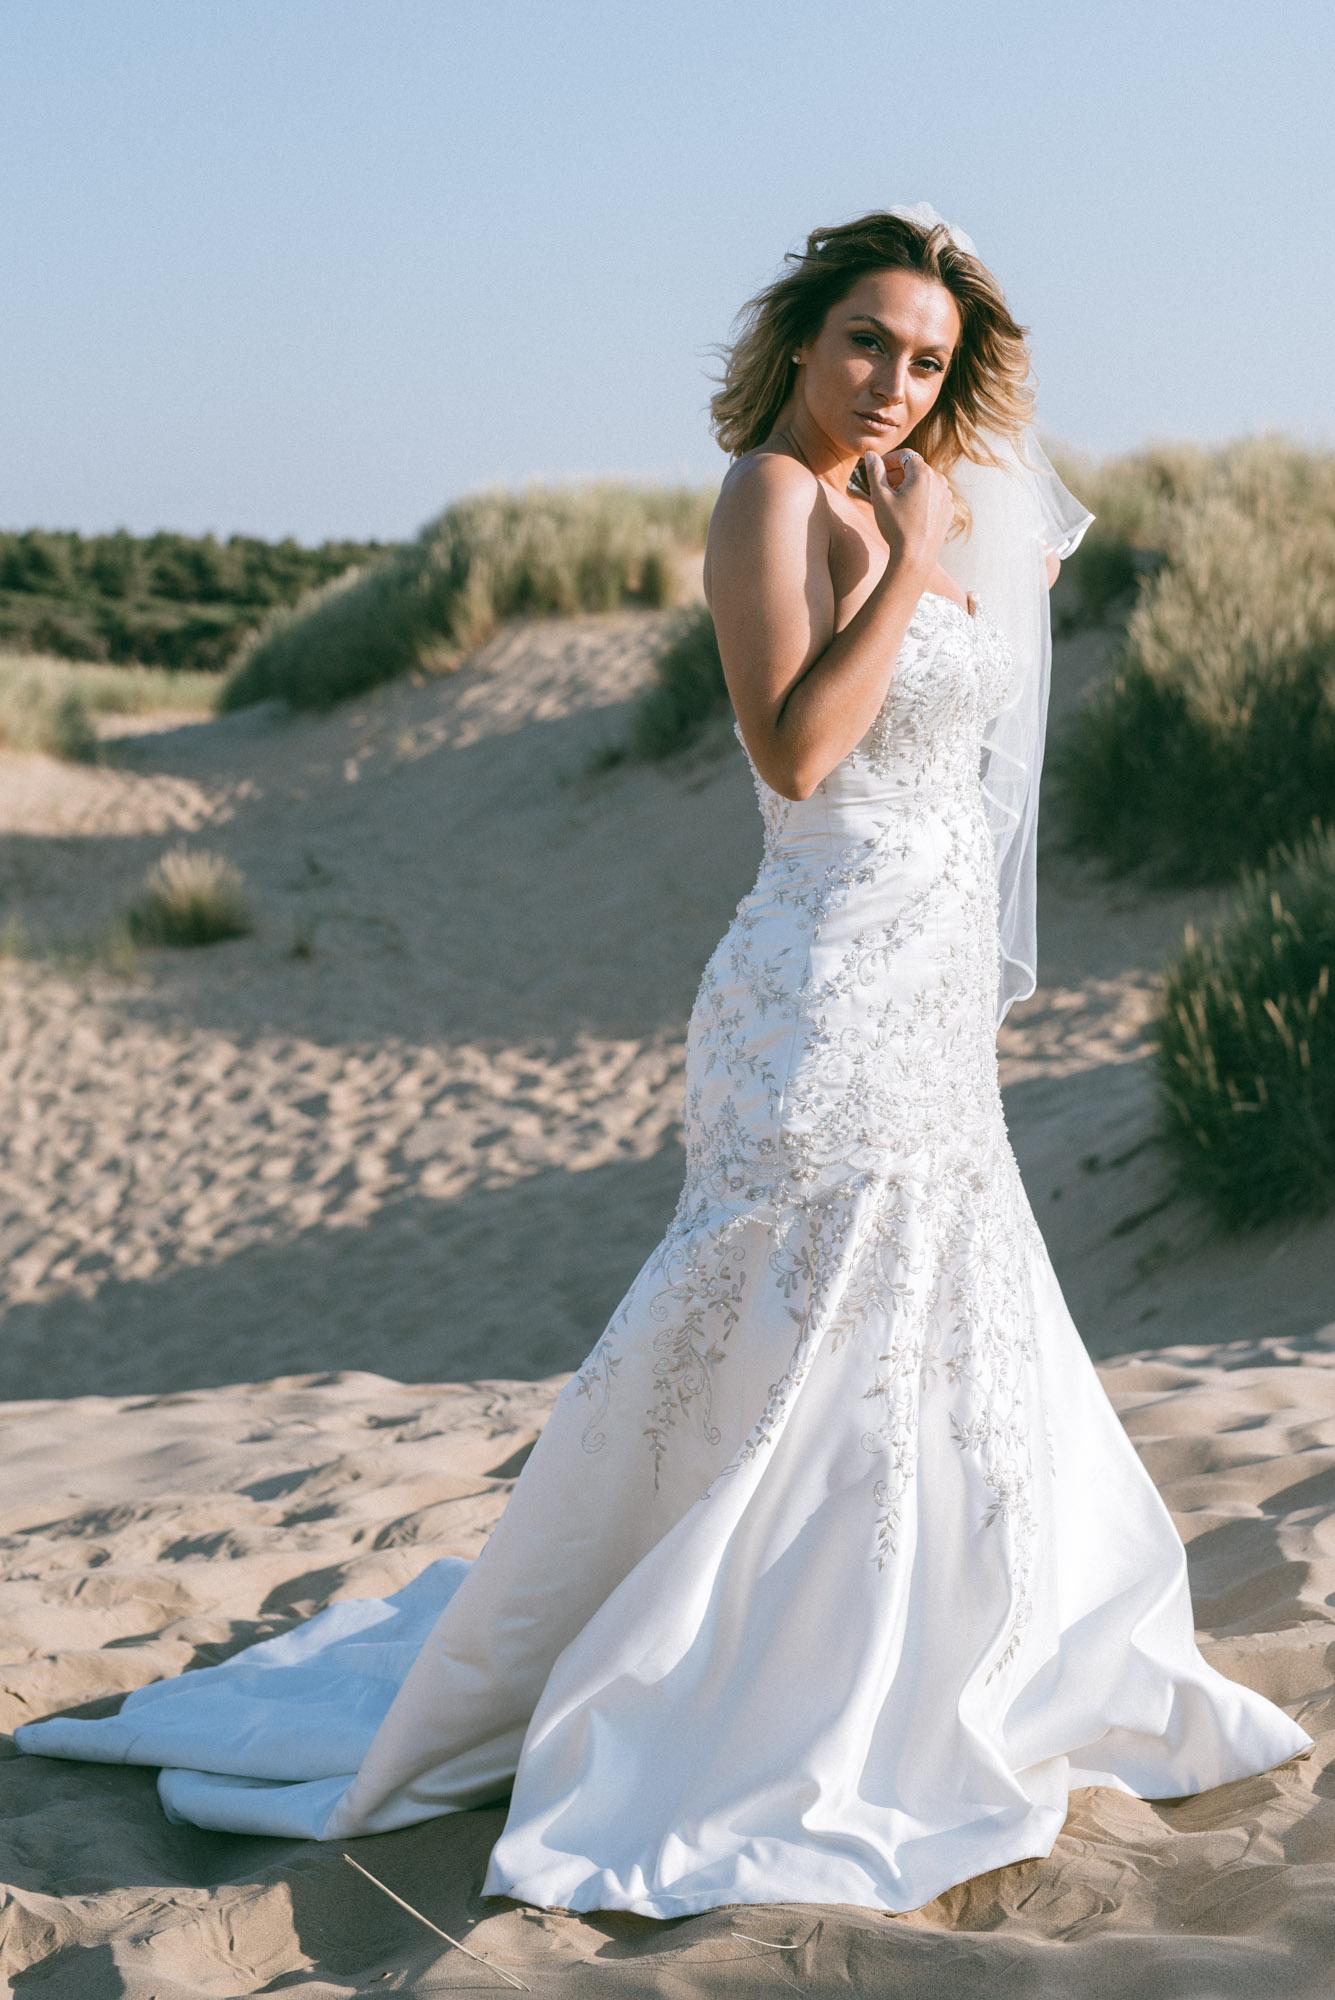 Wedding dress side view